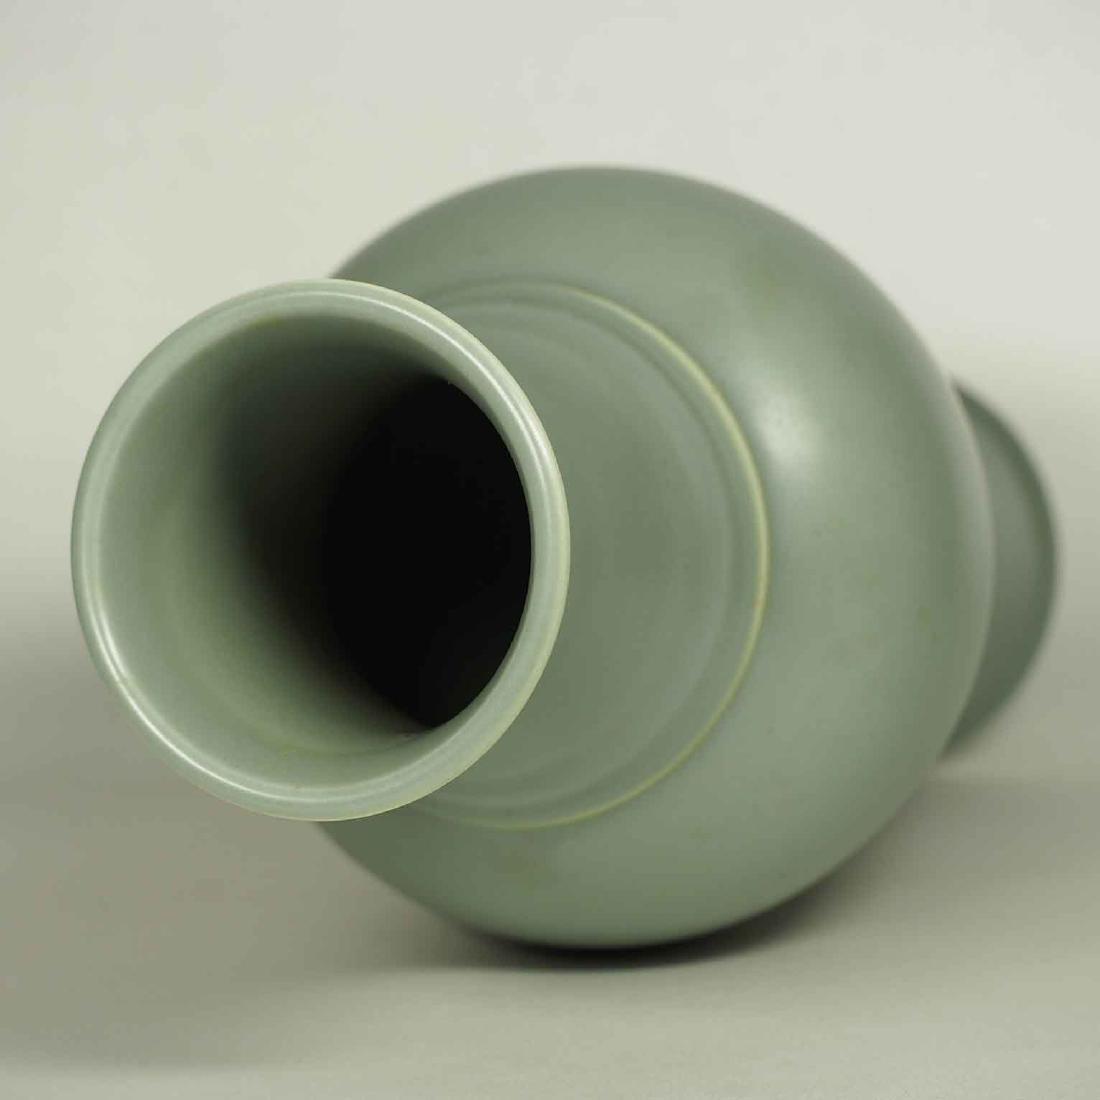 Wintergreen Vase, Qianlong Mark, late Qing Dynasty - 3